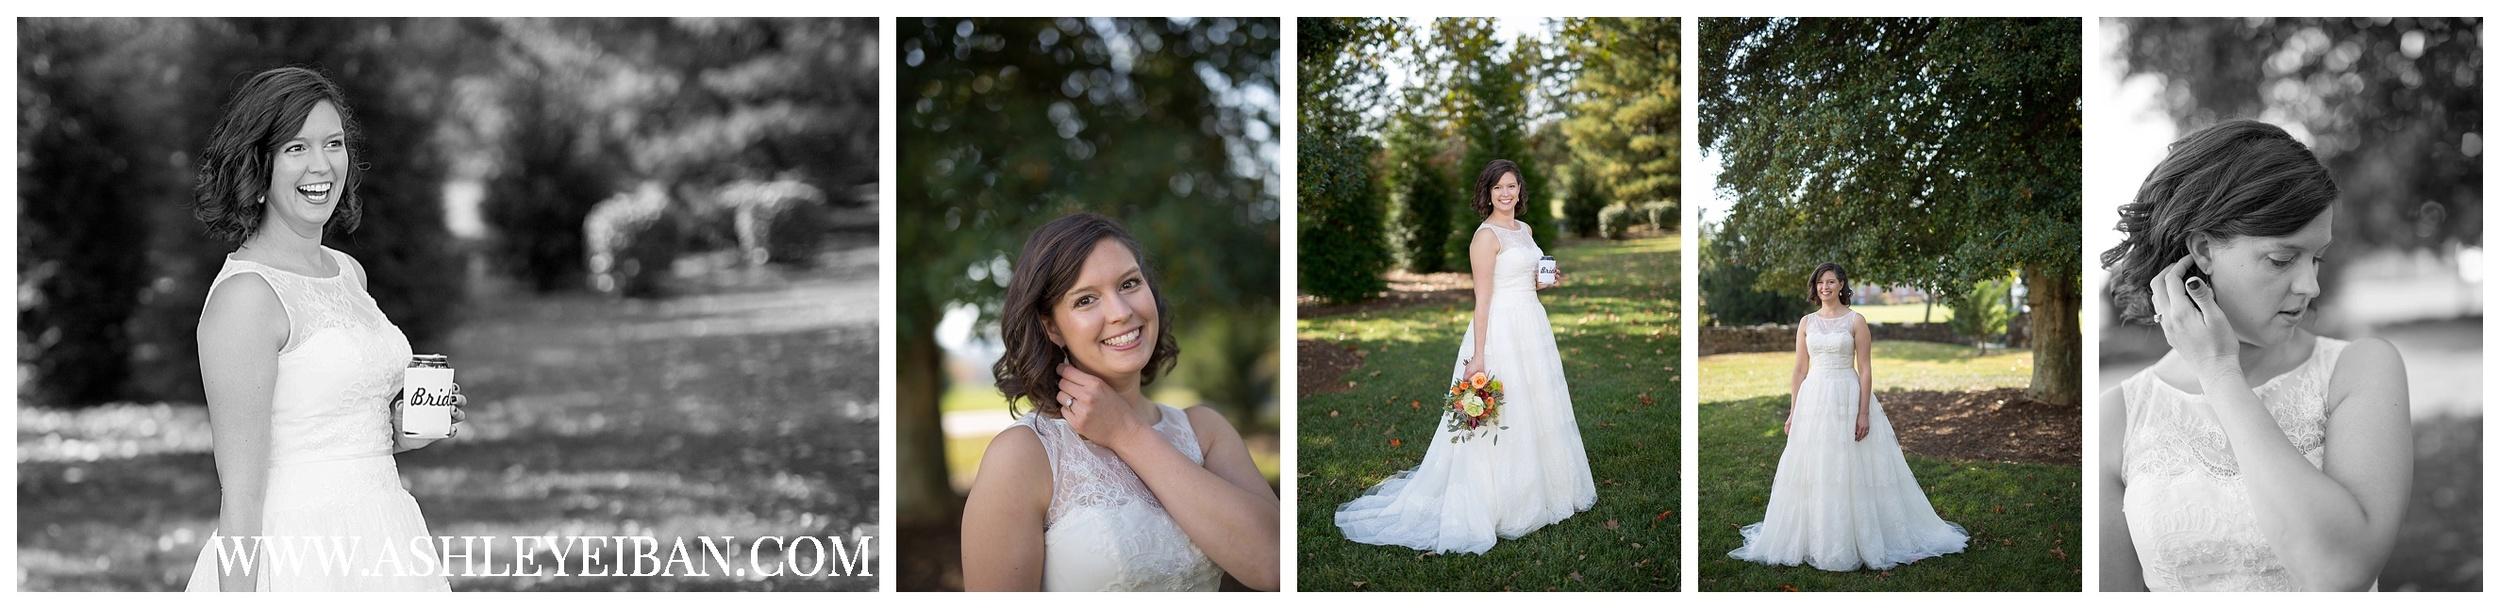 Lynchburg, VA Wedding Photographer || Wedding at The Trivium || Central Virginia Wedding Photographer || Ashley Eiban Photography || www.ashleyeiban.com